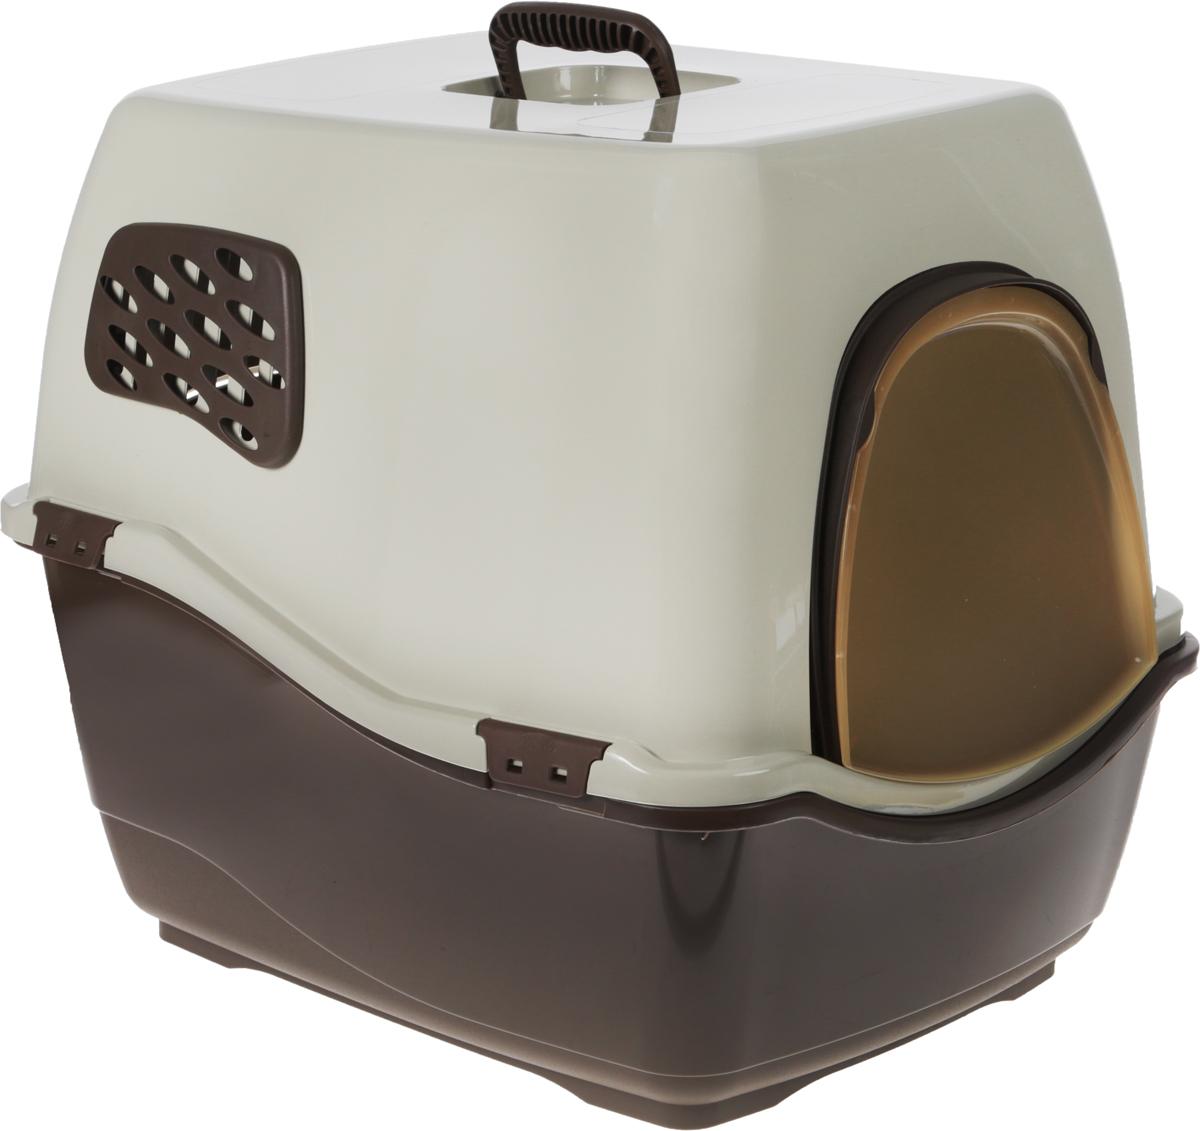 Био-туалет для кошек Marchioro Bill 2F, цвет: коричневый, бежевый, 57 х 45 х 48 см цена